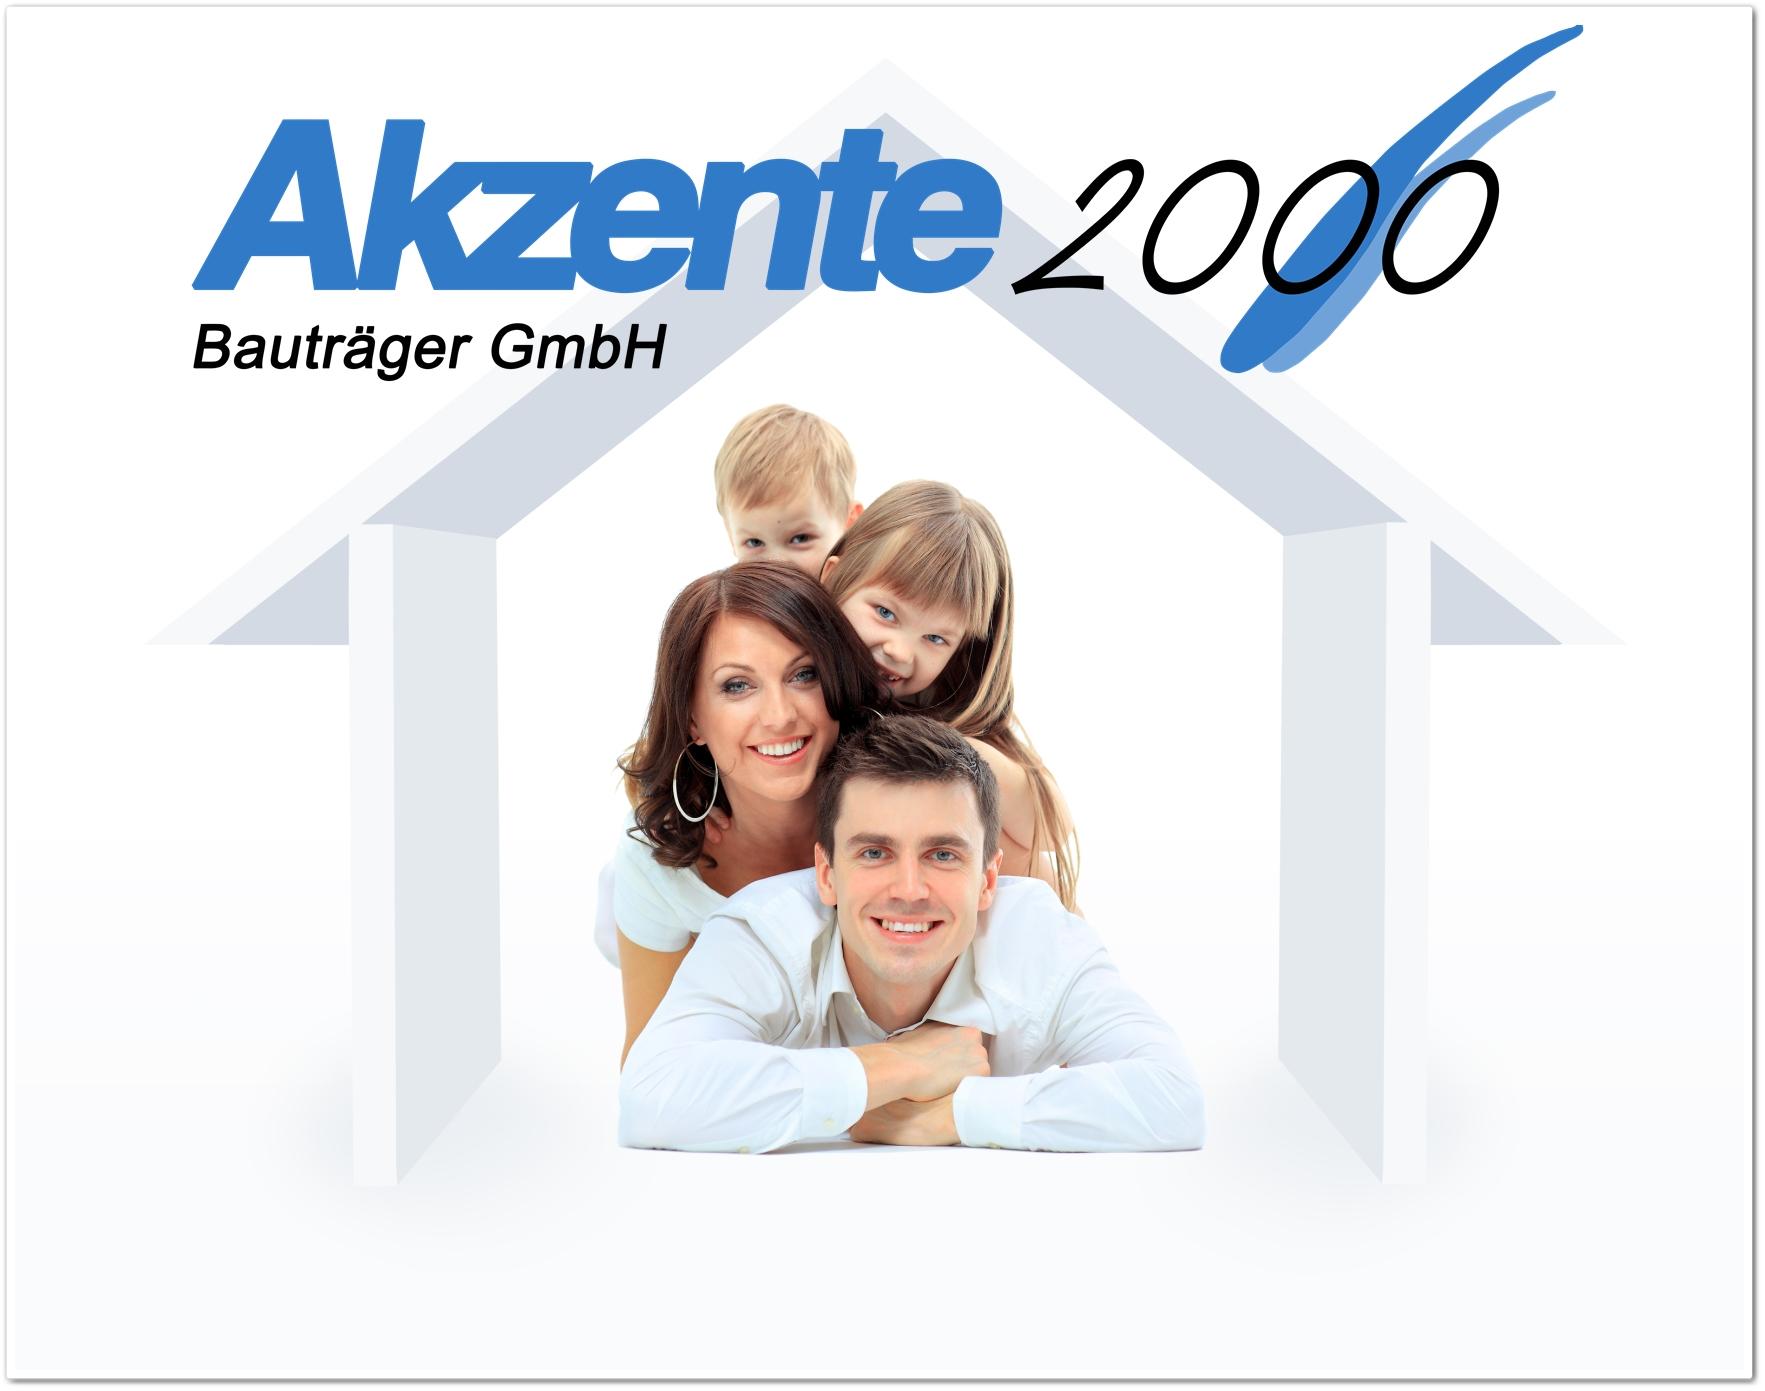 Akzente 2000 Bauträger GmbH in Grasellenbach